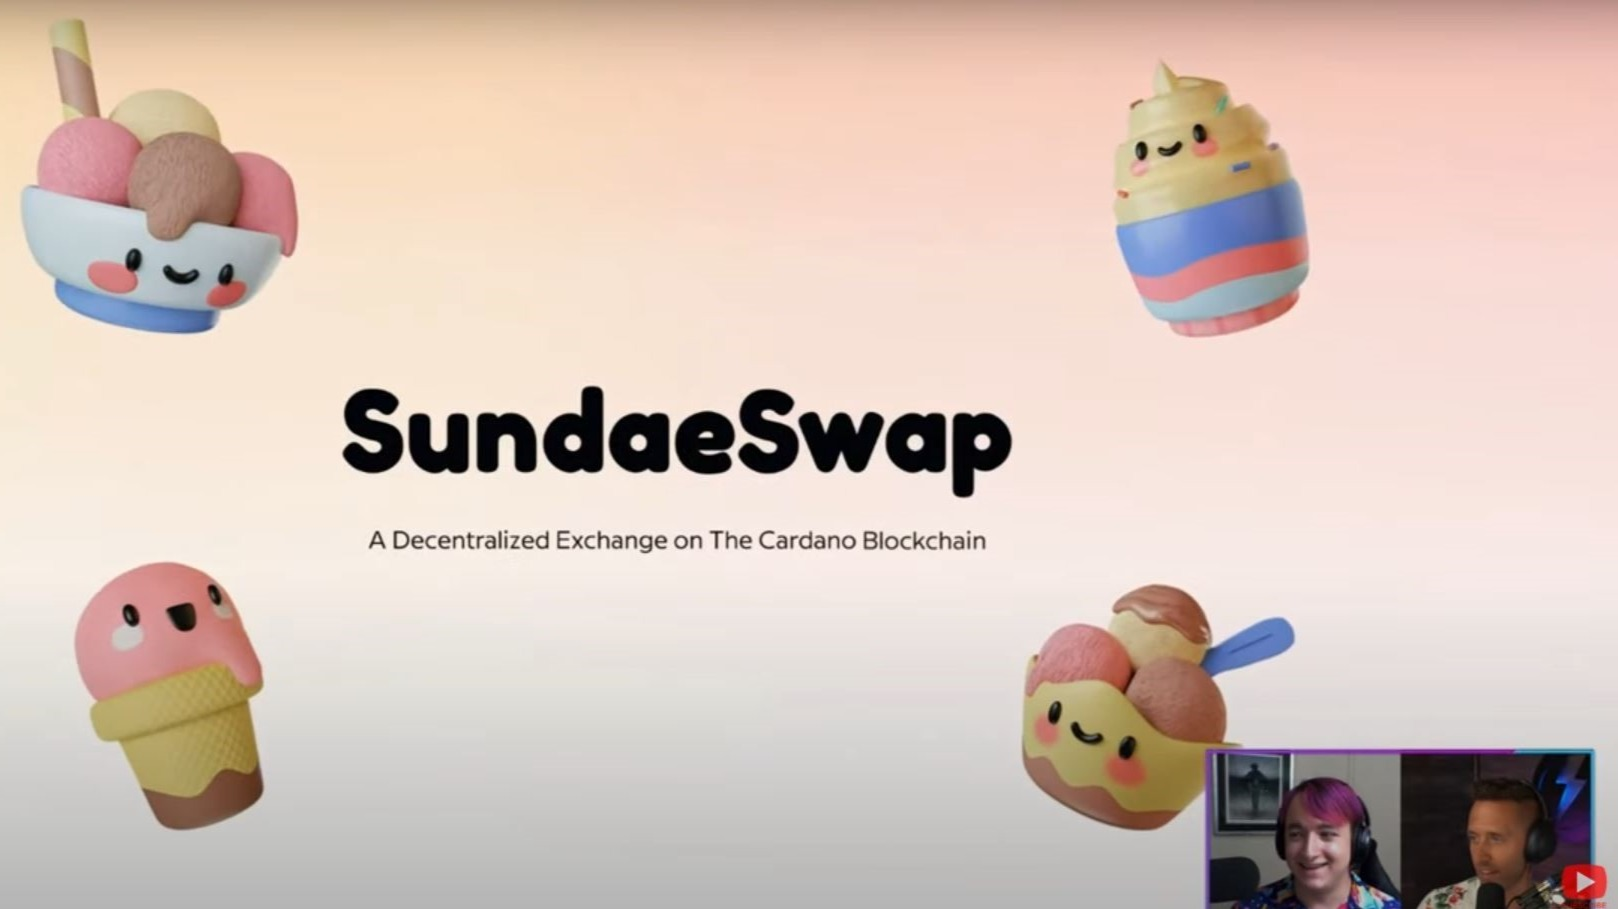 SundaeSwap, DEX on Cardano (Picture: https://www.youtube.com/watch?v=cz-EDAjG3vk)